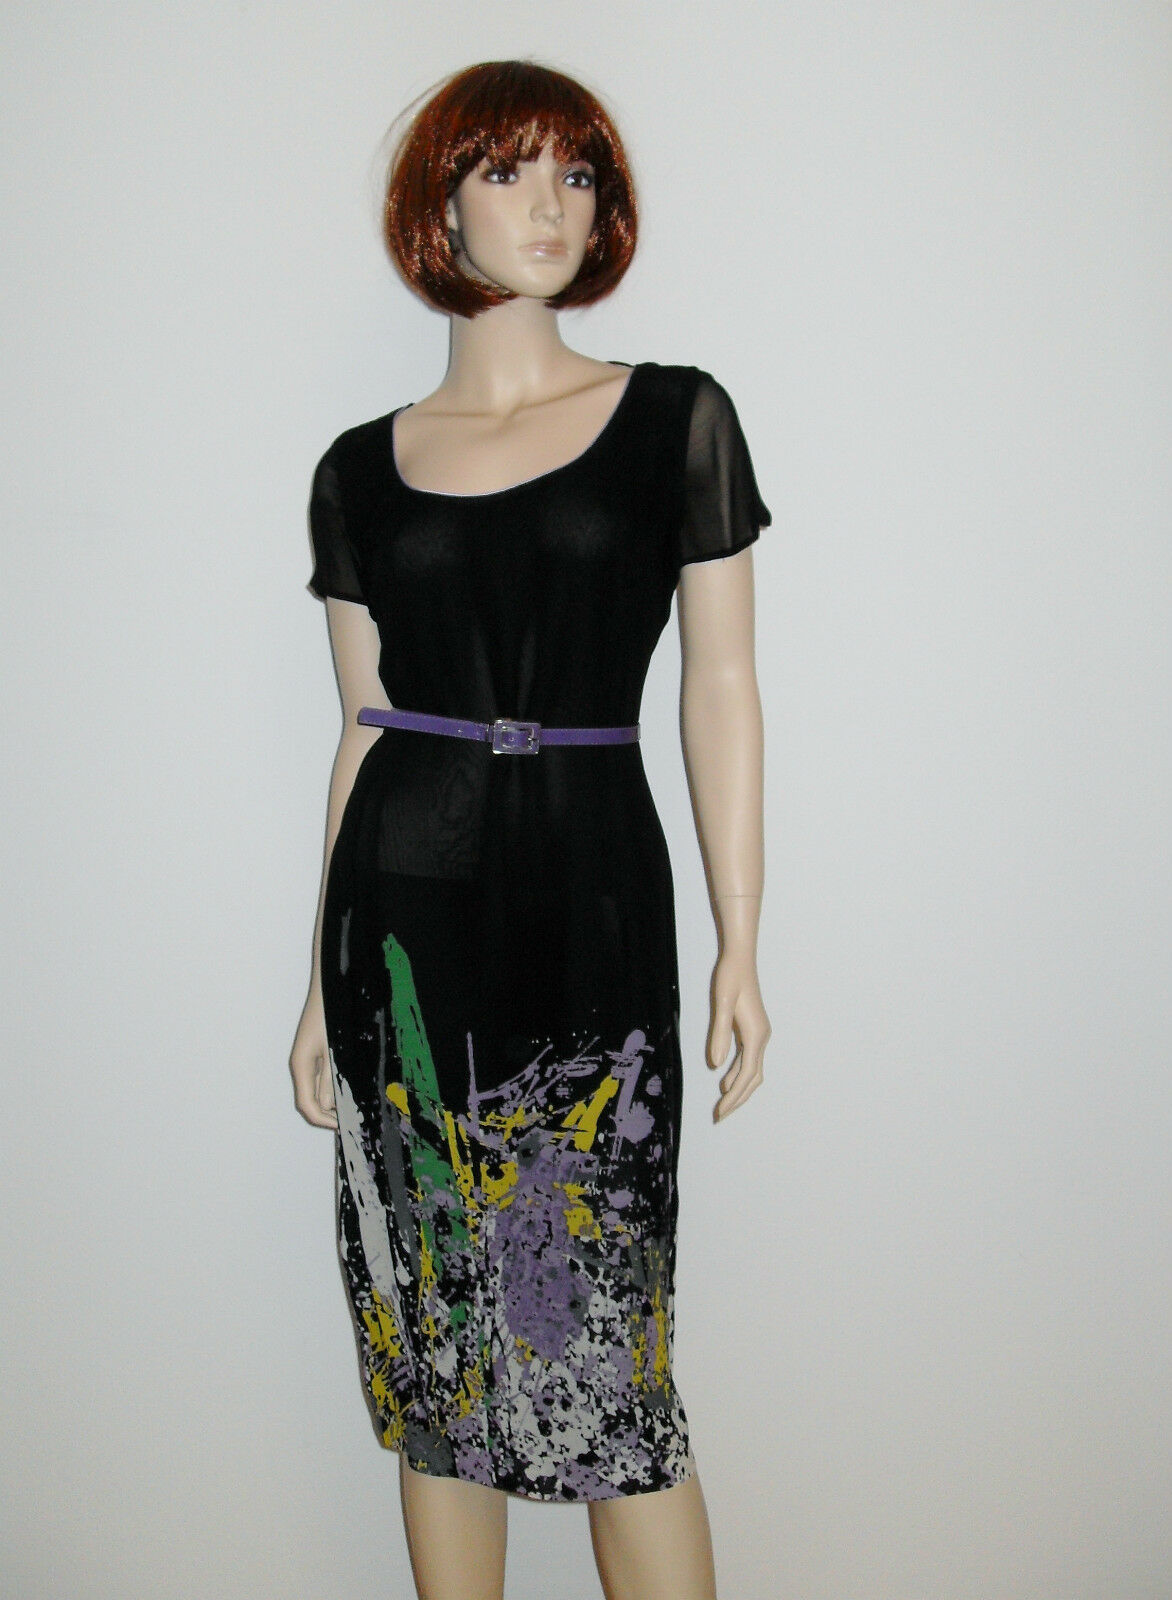 Schönes Kleid mit Gürlel Etuikleid TopDesign  Knielang Kurzarm Mehrfarbig Gr 42